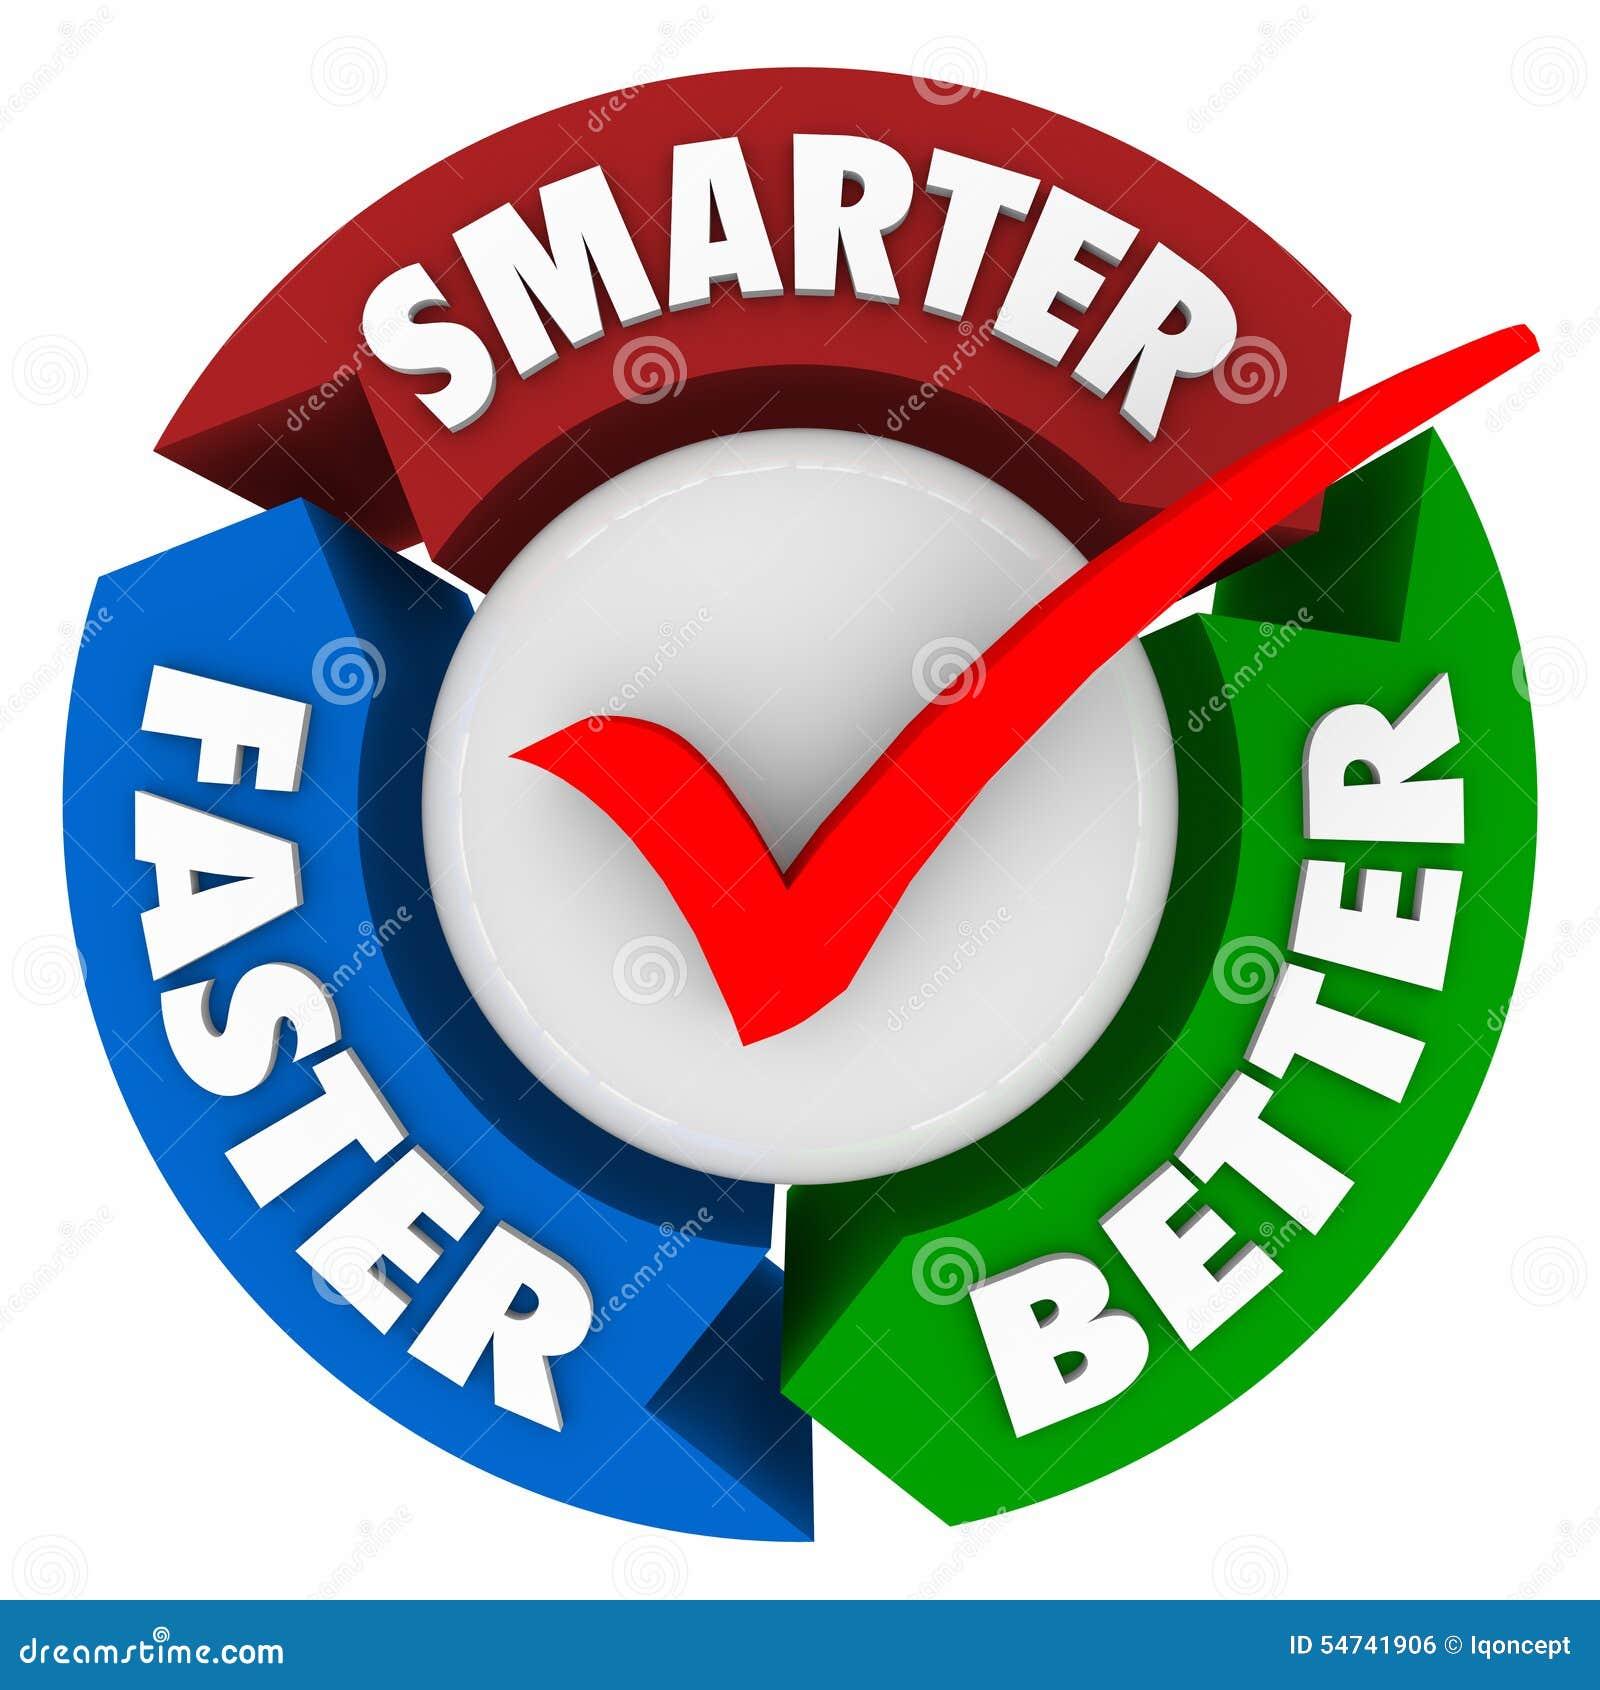 smarter faster better pdf free download